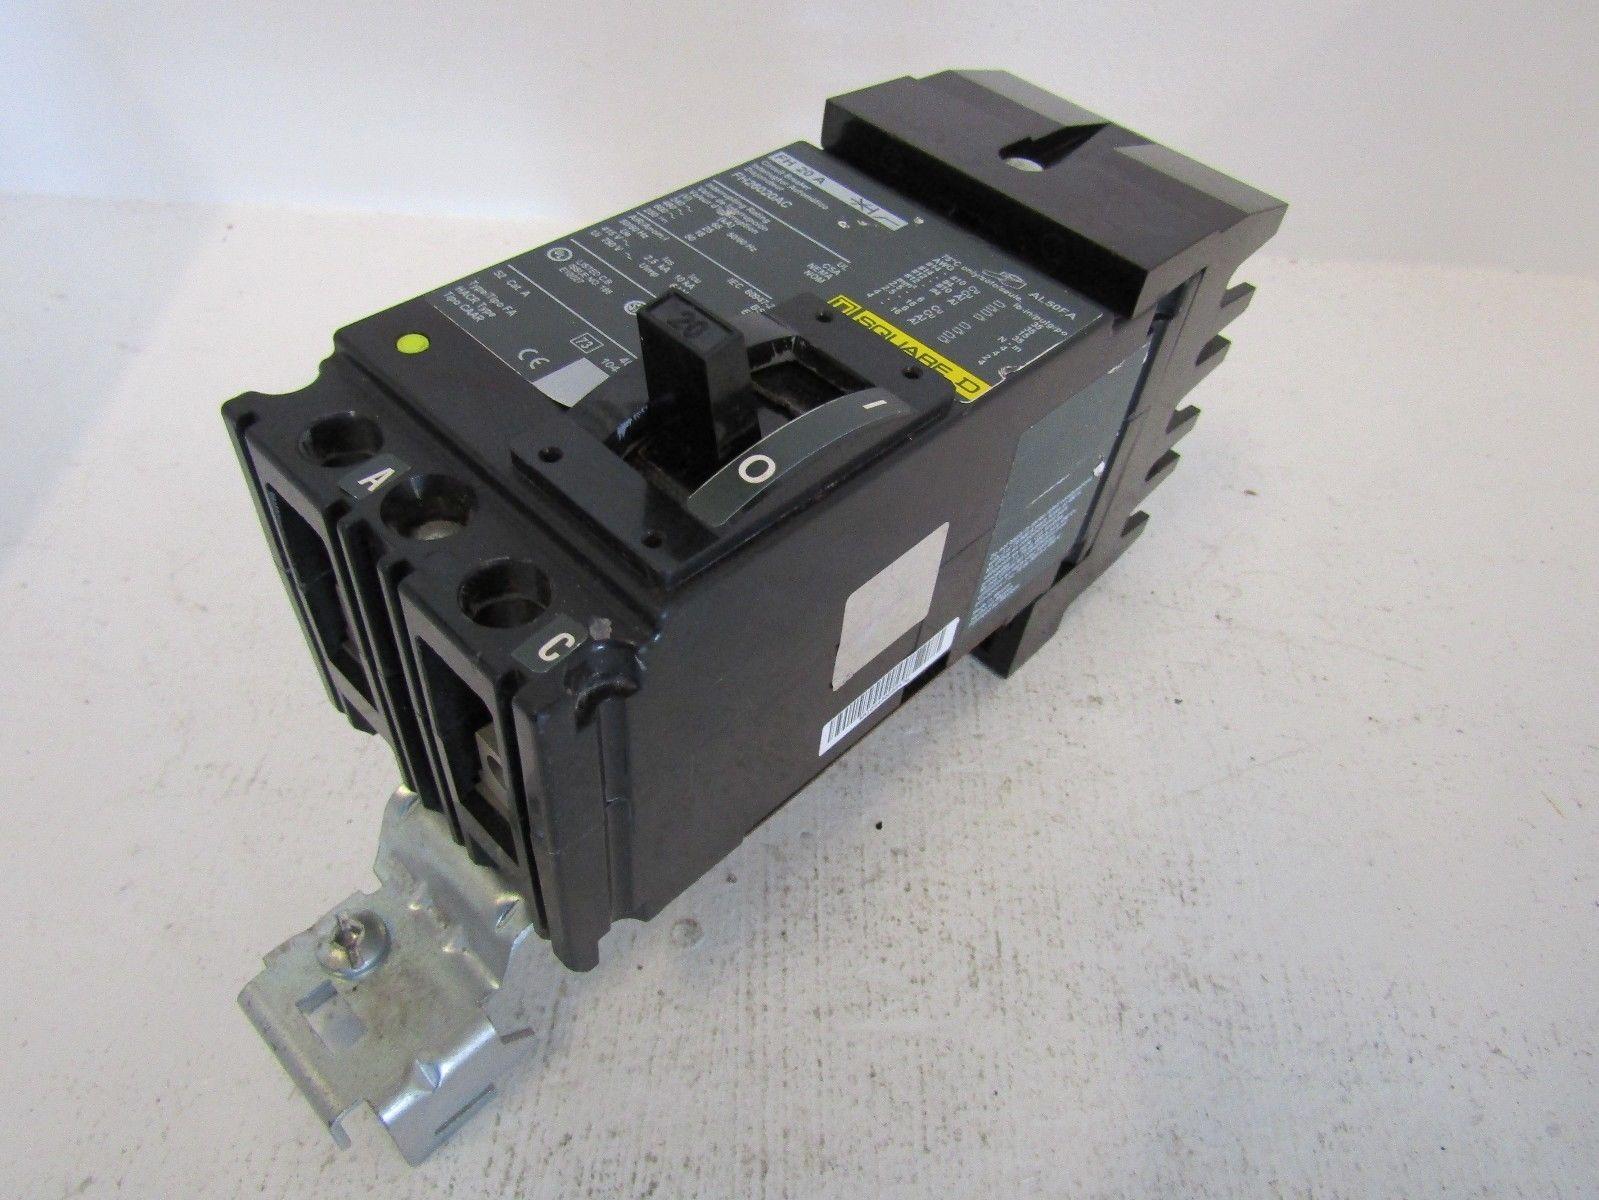 NEW SQUARE D FH26020AC 2 POLE 20 AMP 600 VOLT I-LINE CIRCUIT BREAKER ...